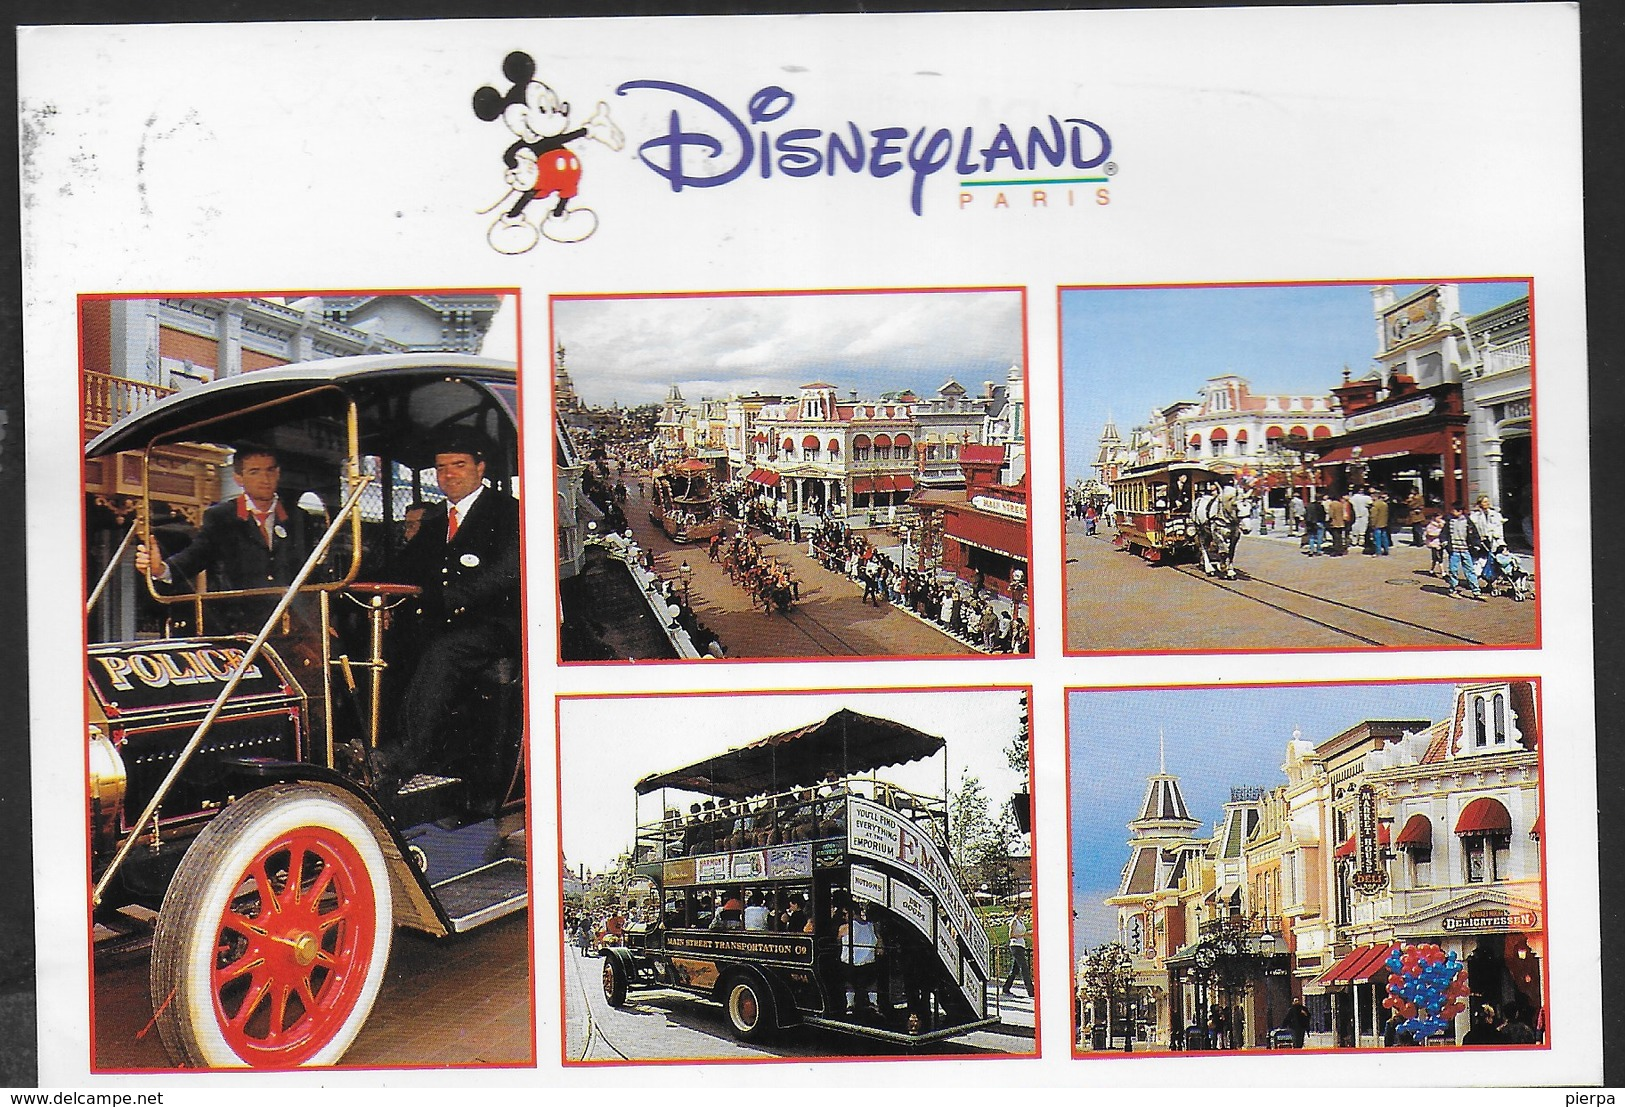 DYSNEYLAND - MAIN STREET - VIAGGIATA 1996 FRANCOBOLLO ASPORTATO - Disneyland